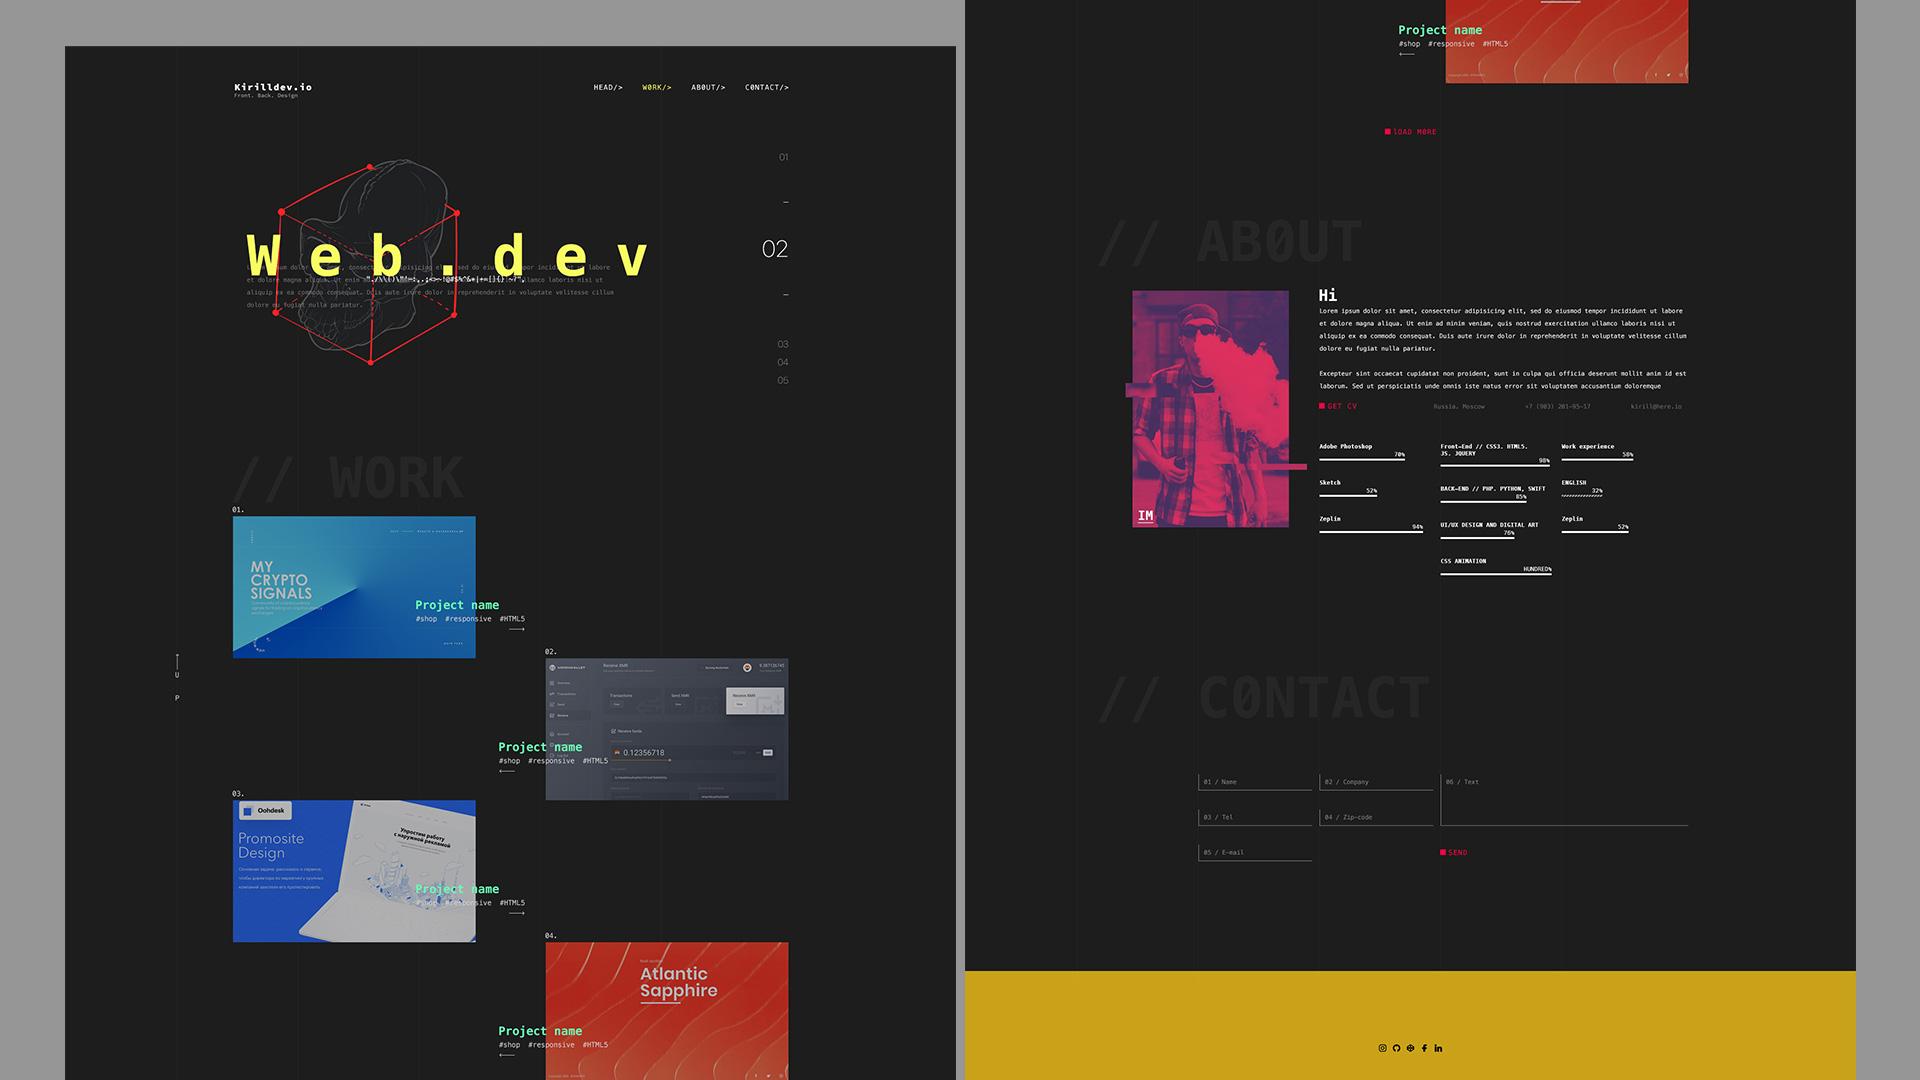 Web.dev